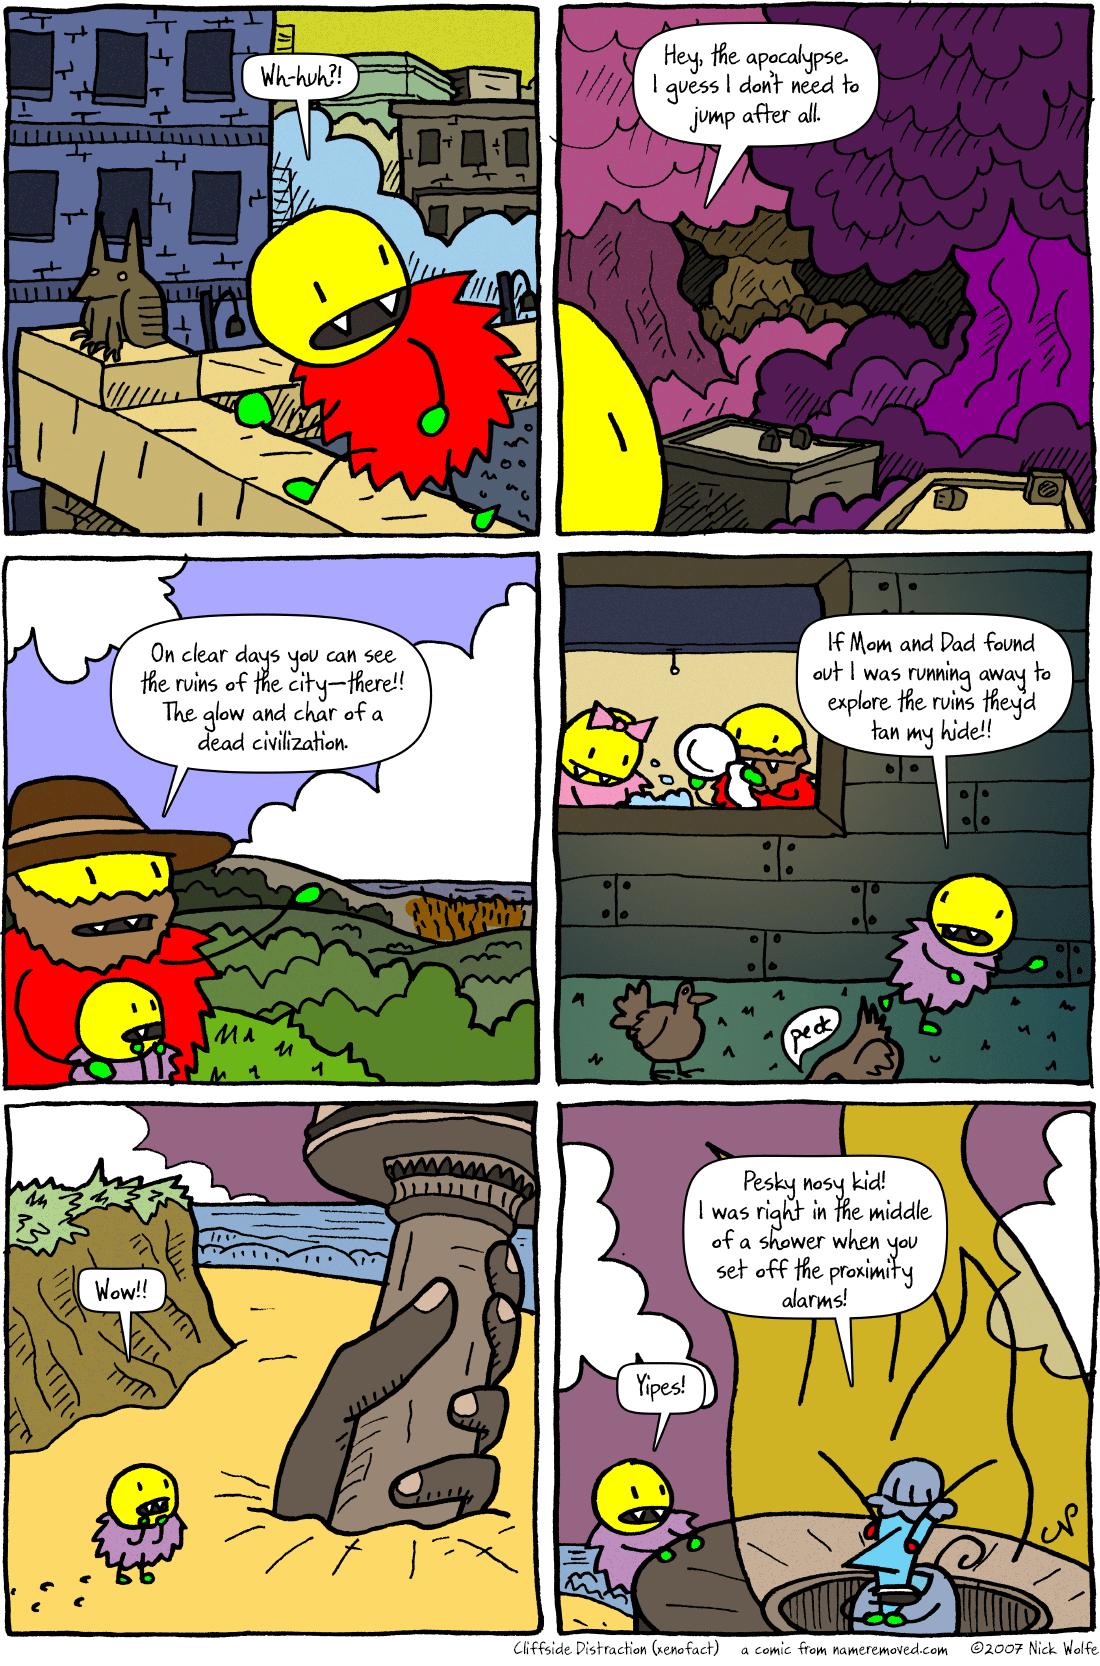 Cliffside Distraction (xenofact)